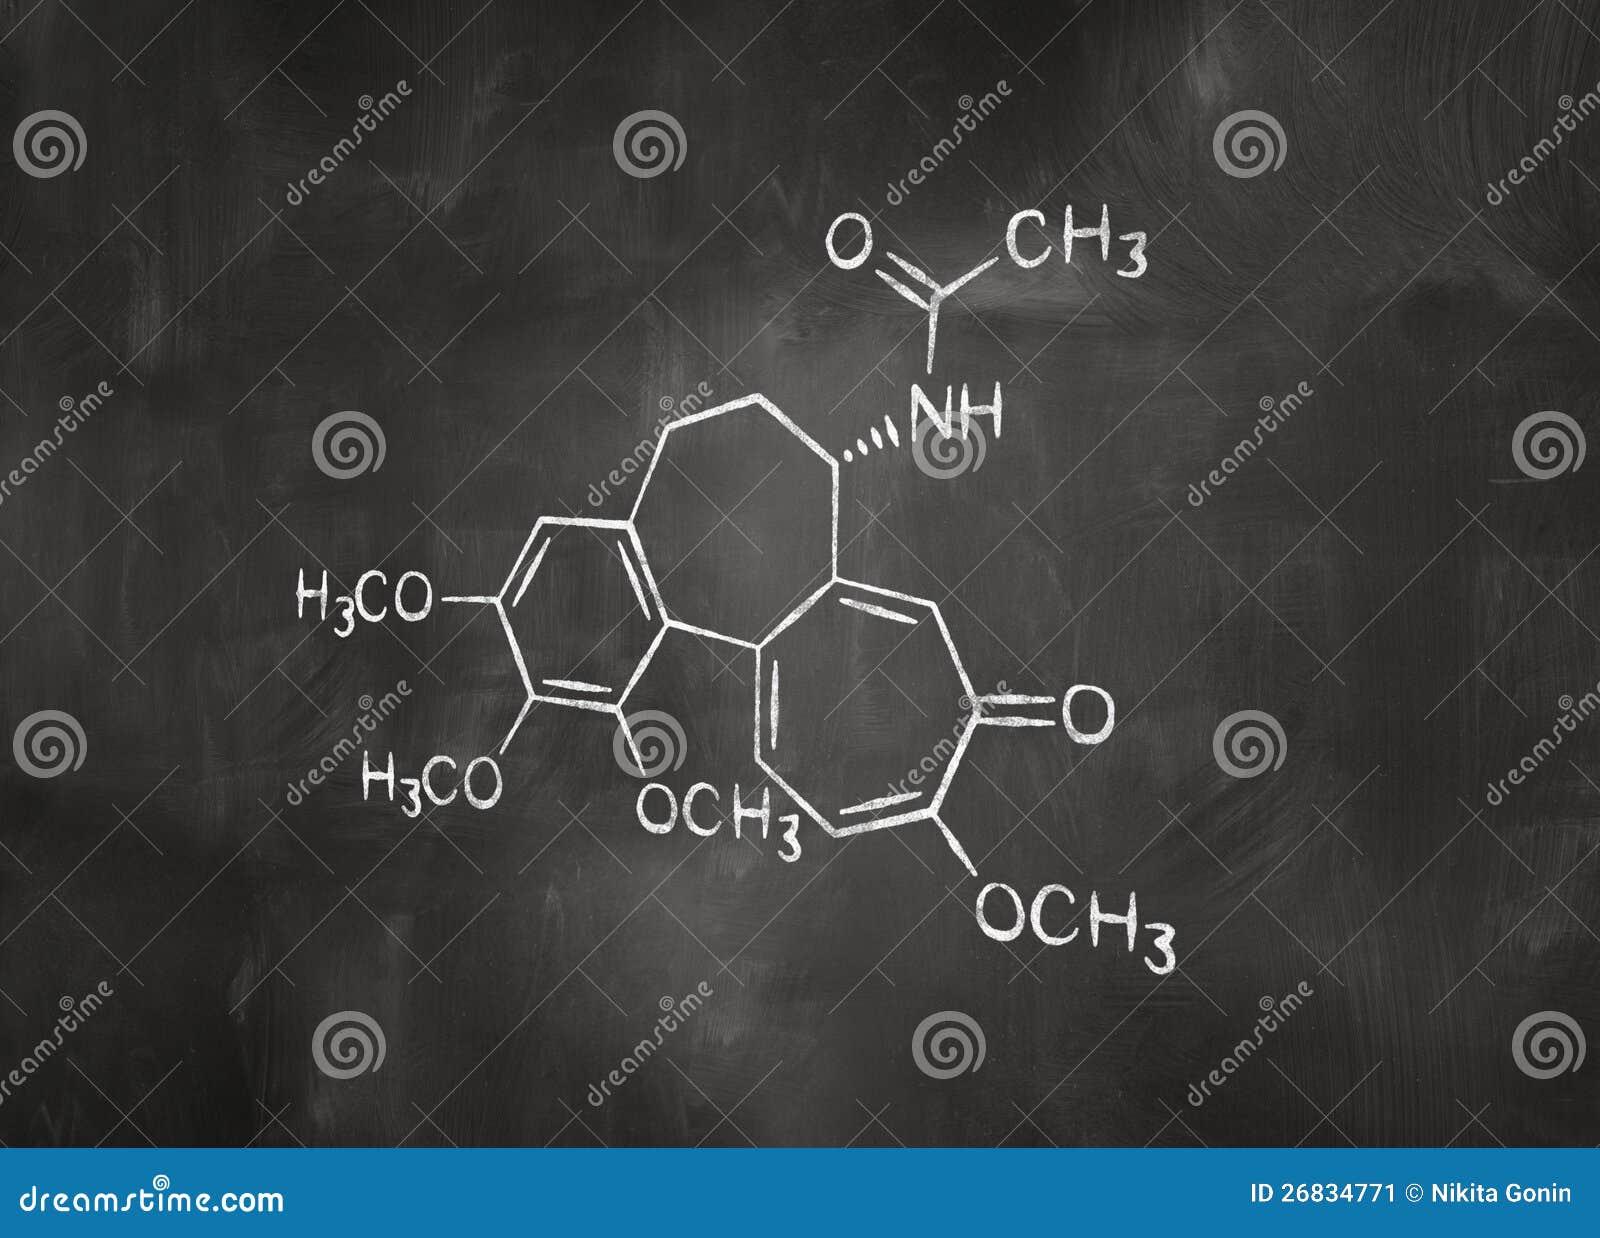 chemische formel auf tafel stockbild bild 26834771. Black Bedroom Furniture Sets. Home Design Ideas